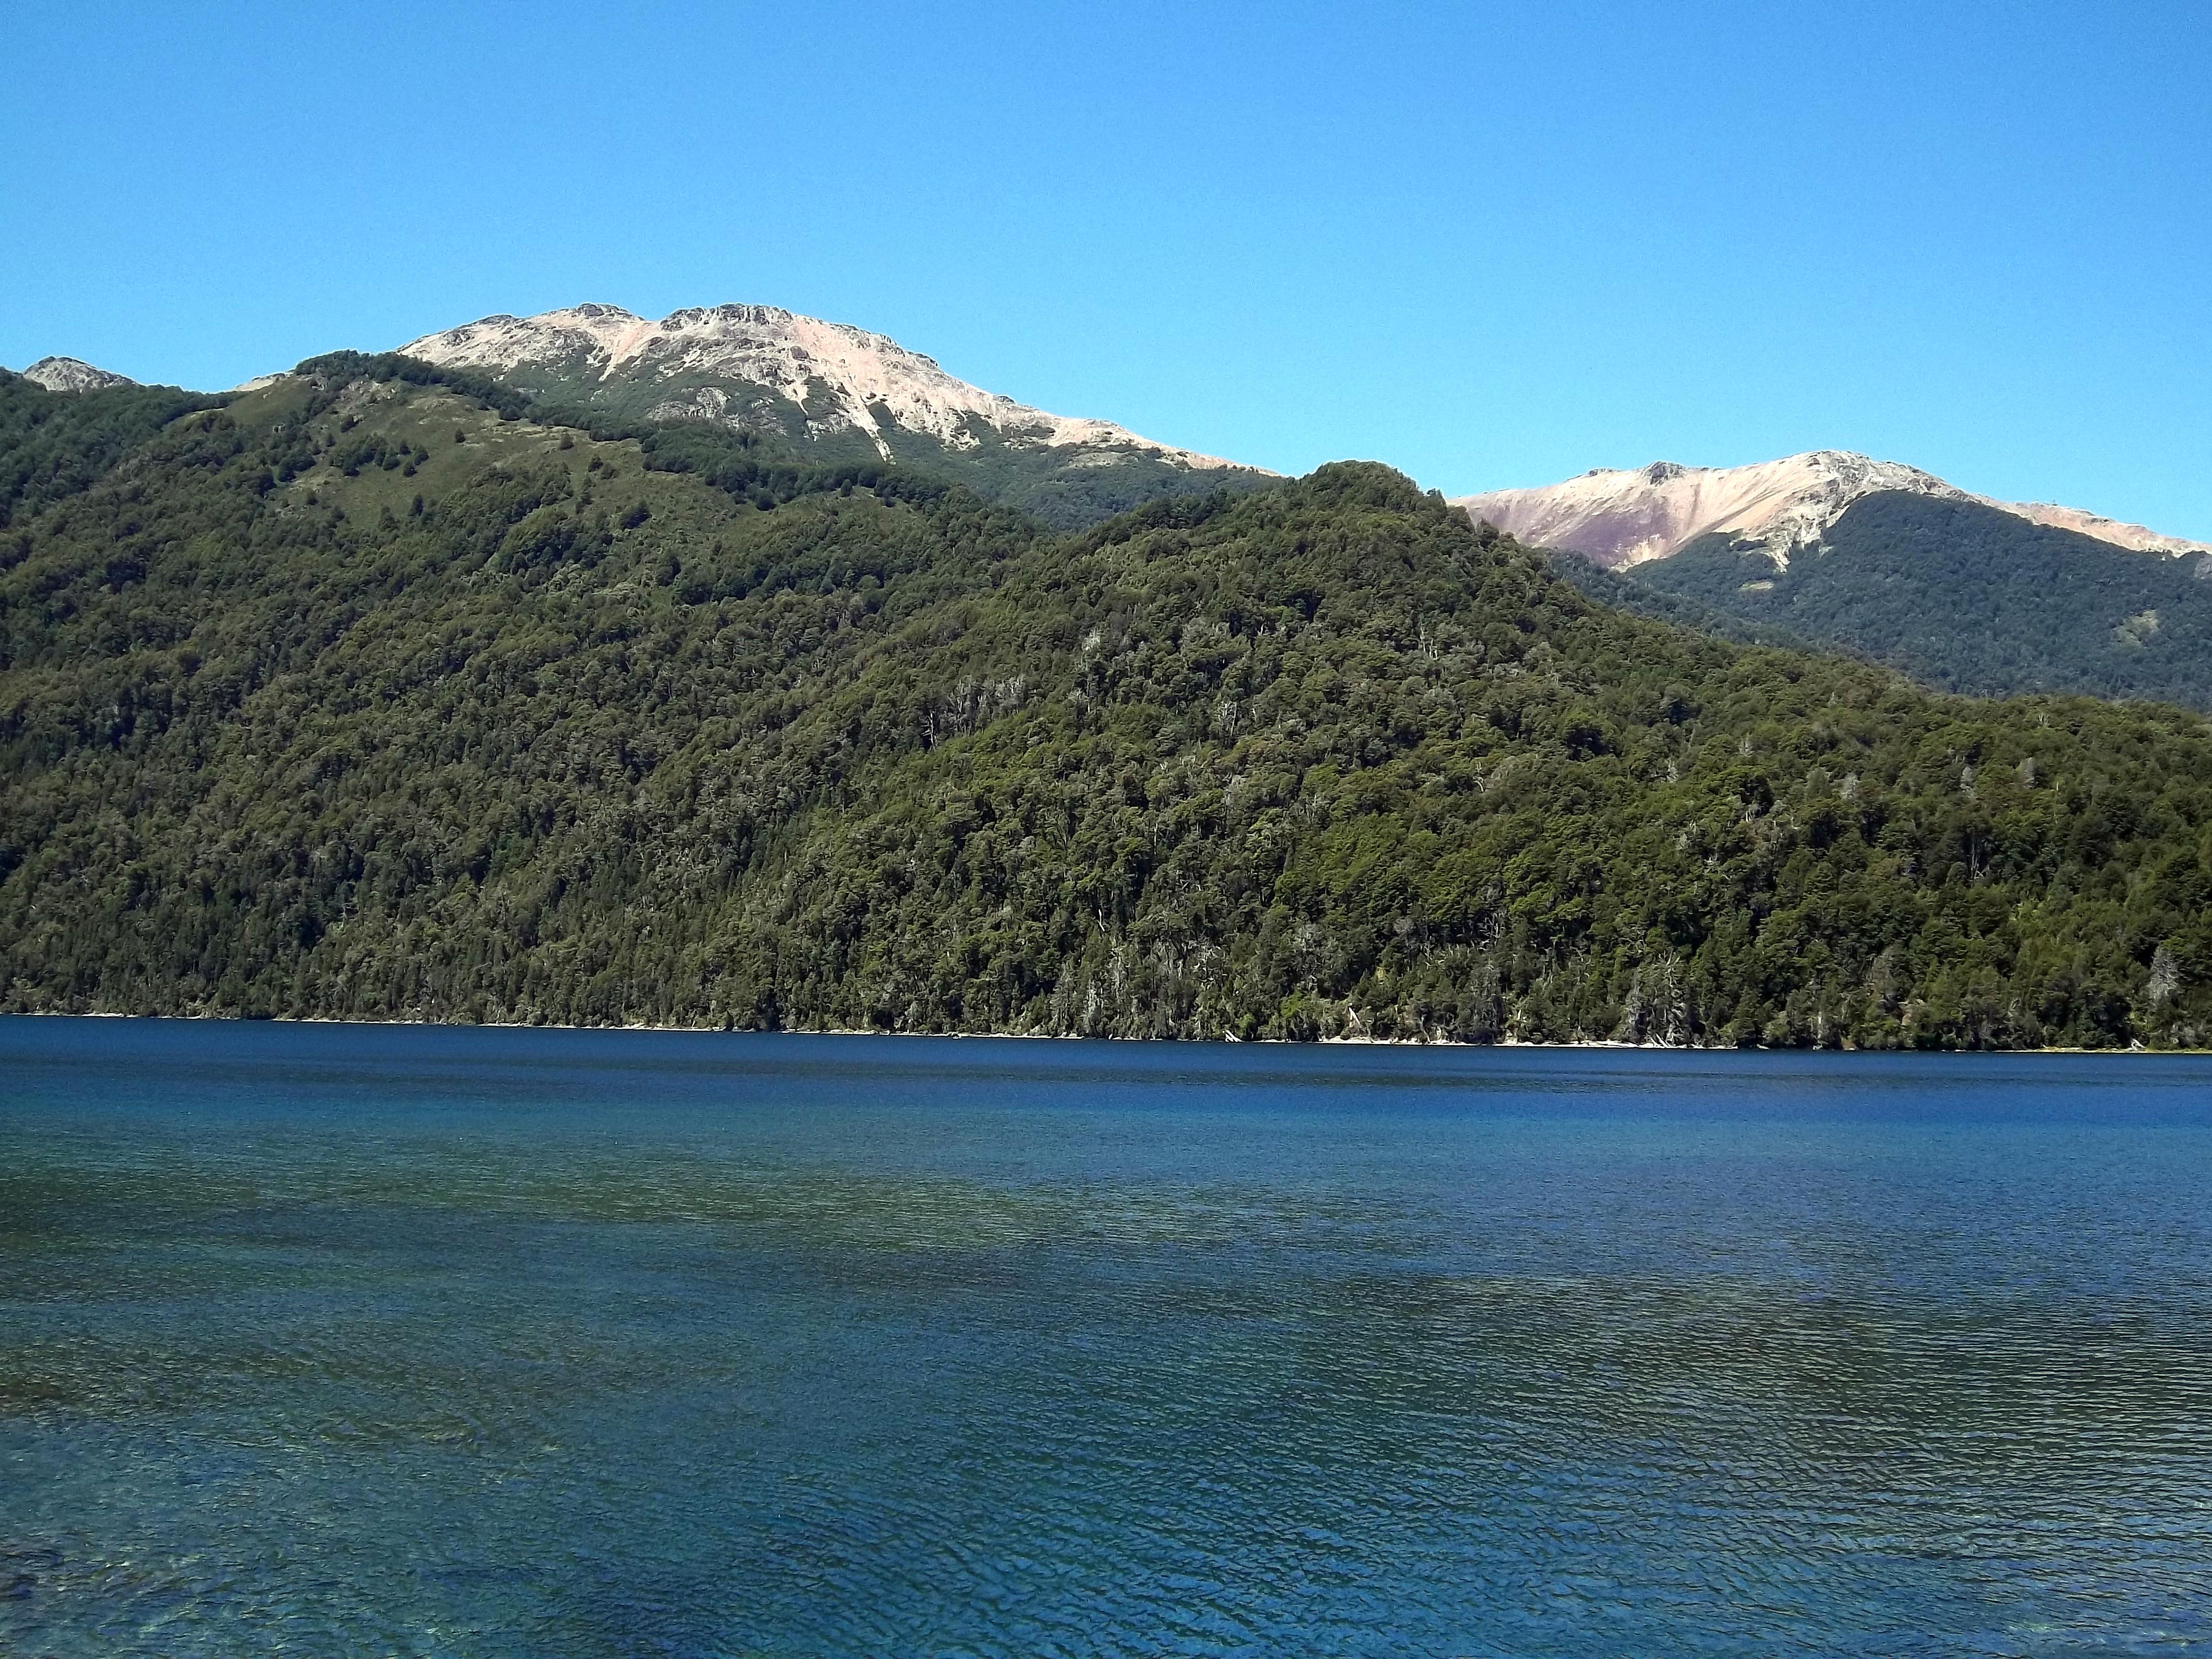 Lago Correntoso - Ruta de los Siete Lagos - Argentina - Wikimedia Commons - Dario Alpern